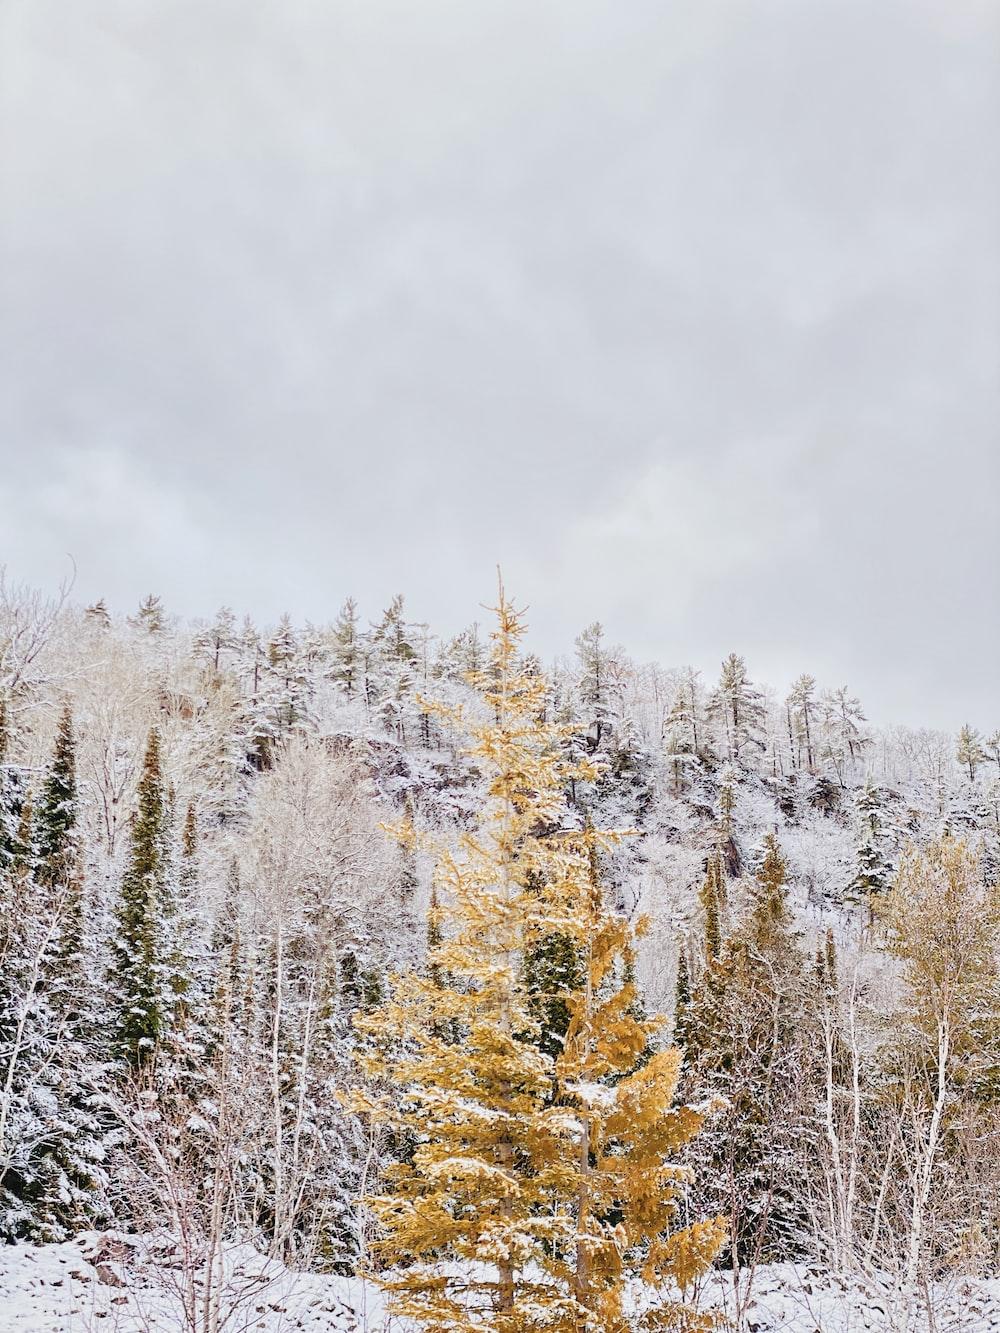 snow covered trees under white sky during daytime